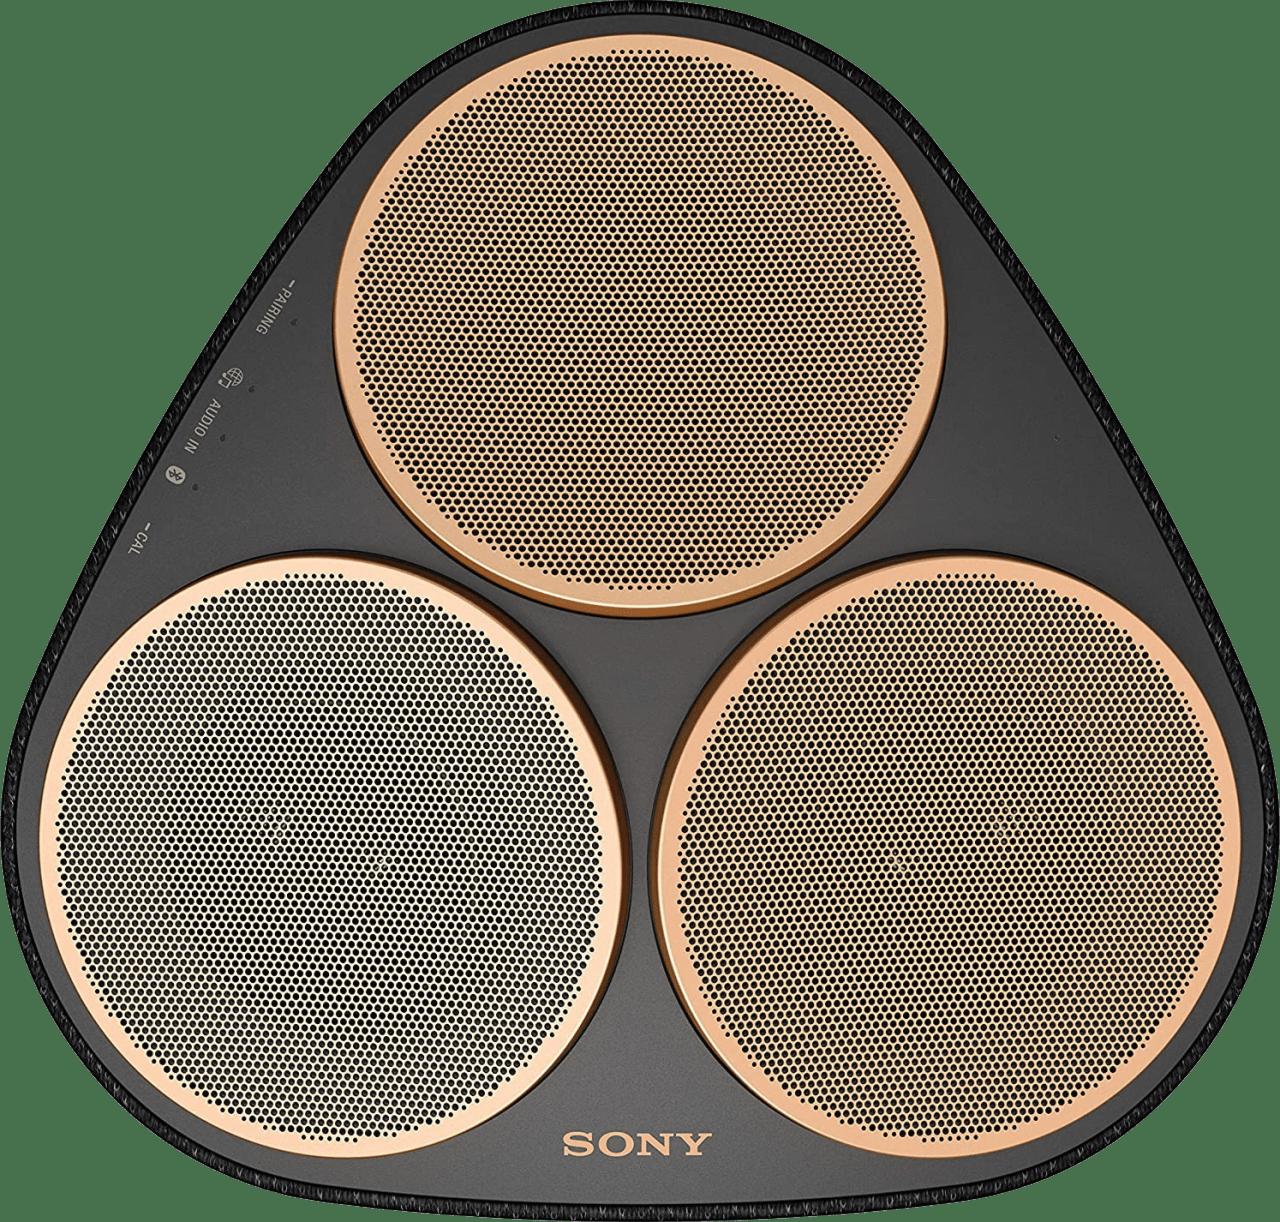 Black Sony SRS-RA5000 Premium Wireless Speaker.2